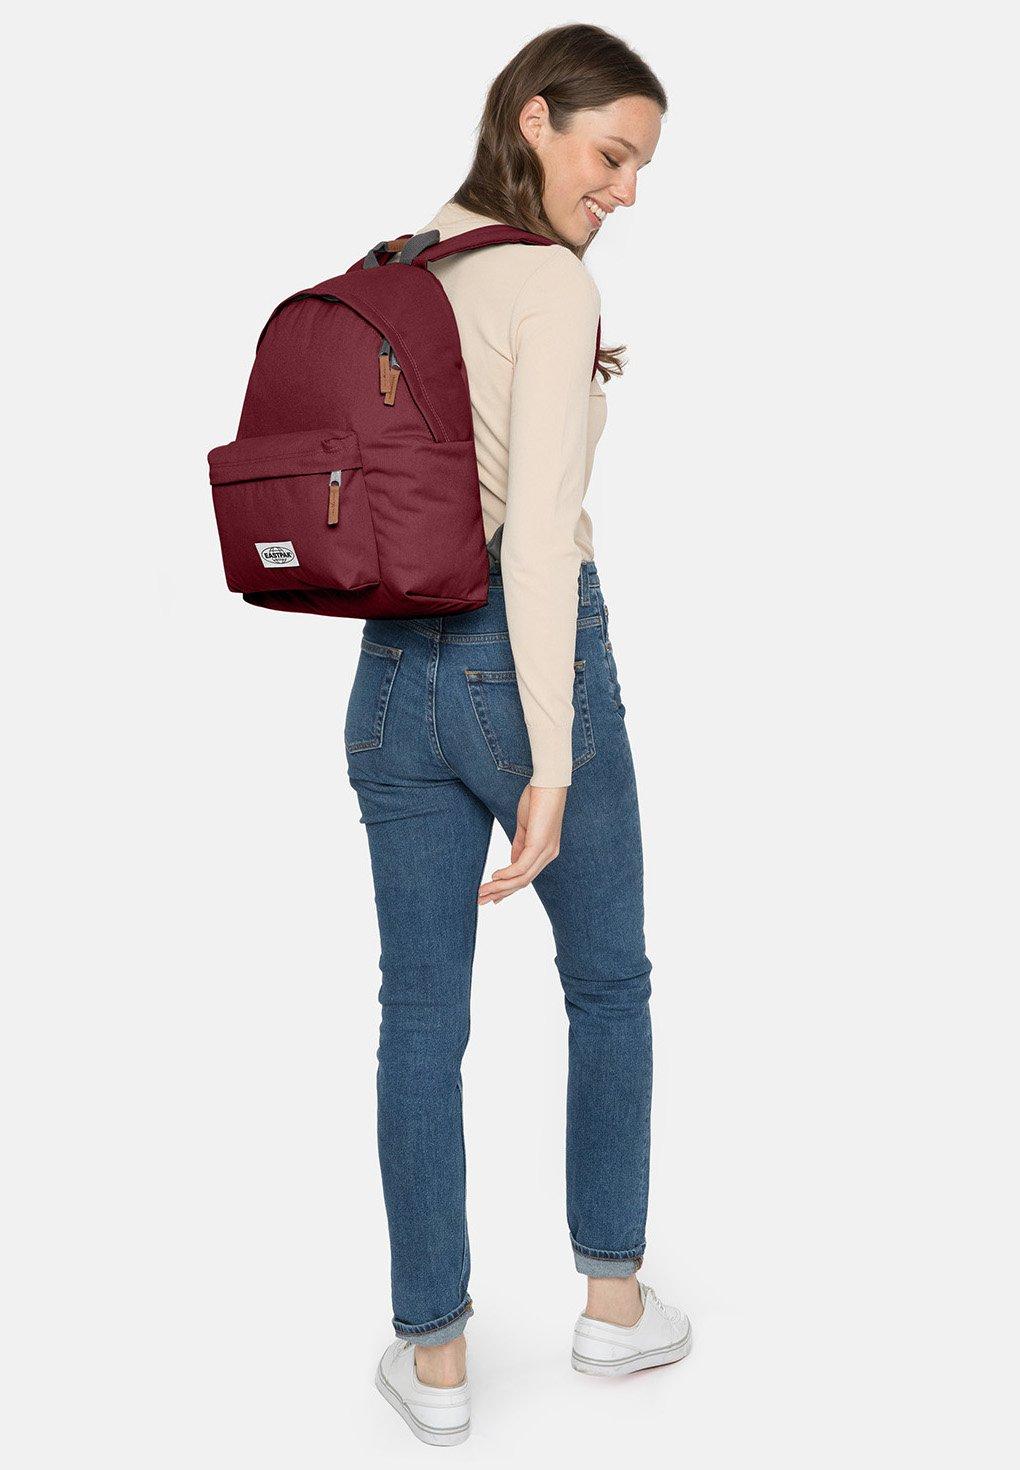 High-Quality Cheap Outlet Eastpak PAK R  - Rucksack - graded brisk | men's accessories 2020 g3Akt